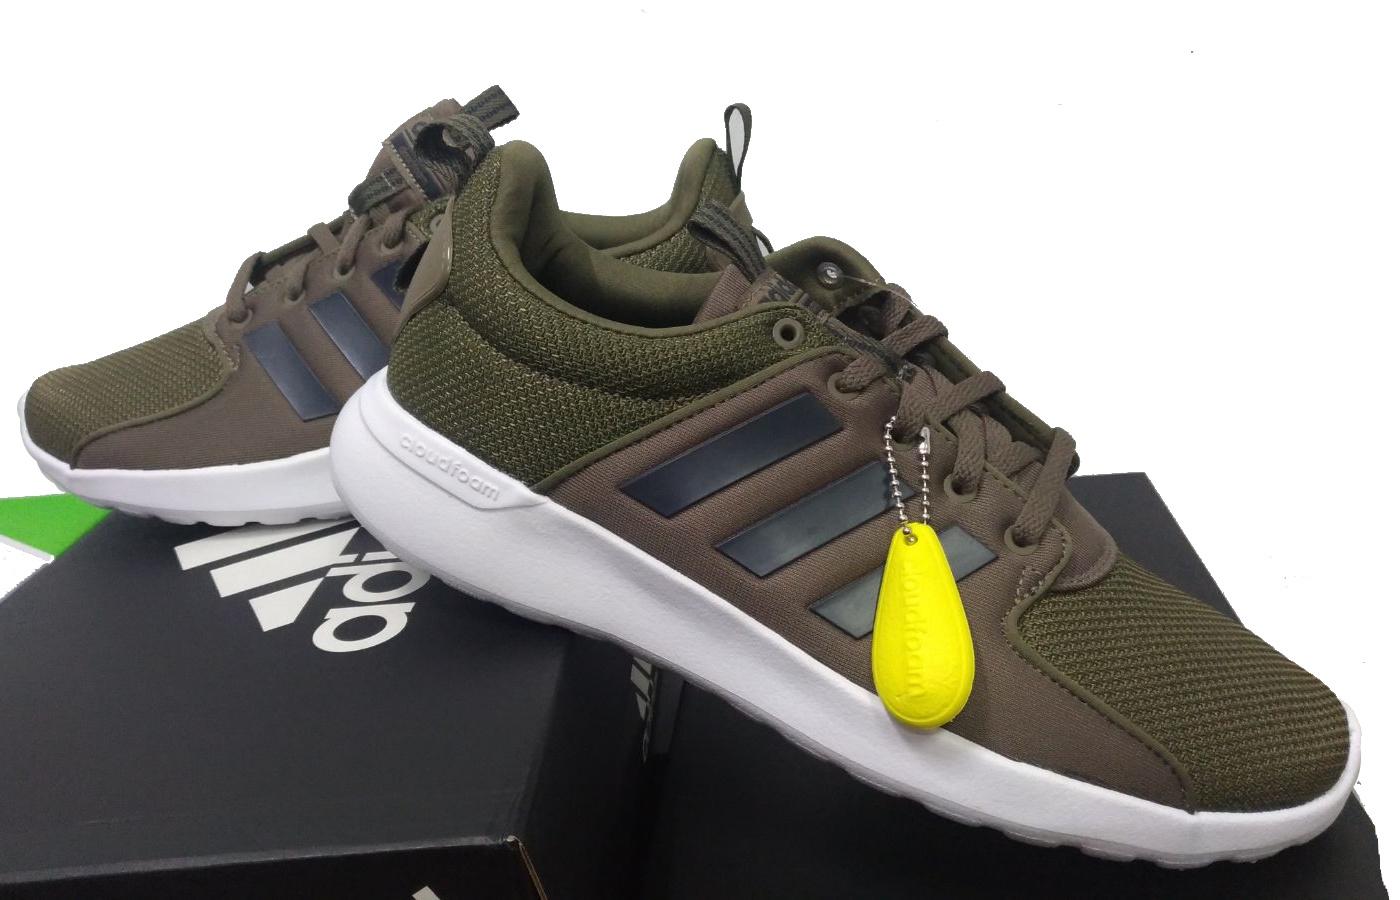 Adidas Scarpe Sneakers Trainers Sportive Ginnastica Tennis Lite Racer Verde  5 5 sur 9 ... d642e0e15eb